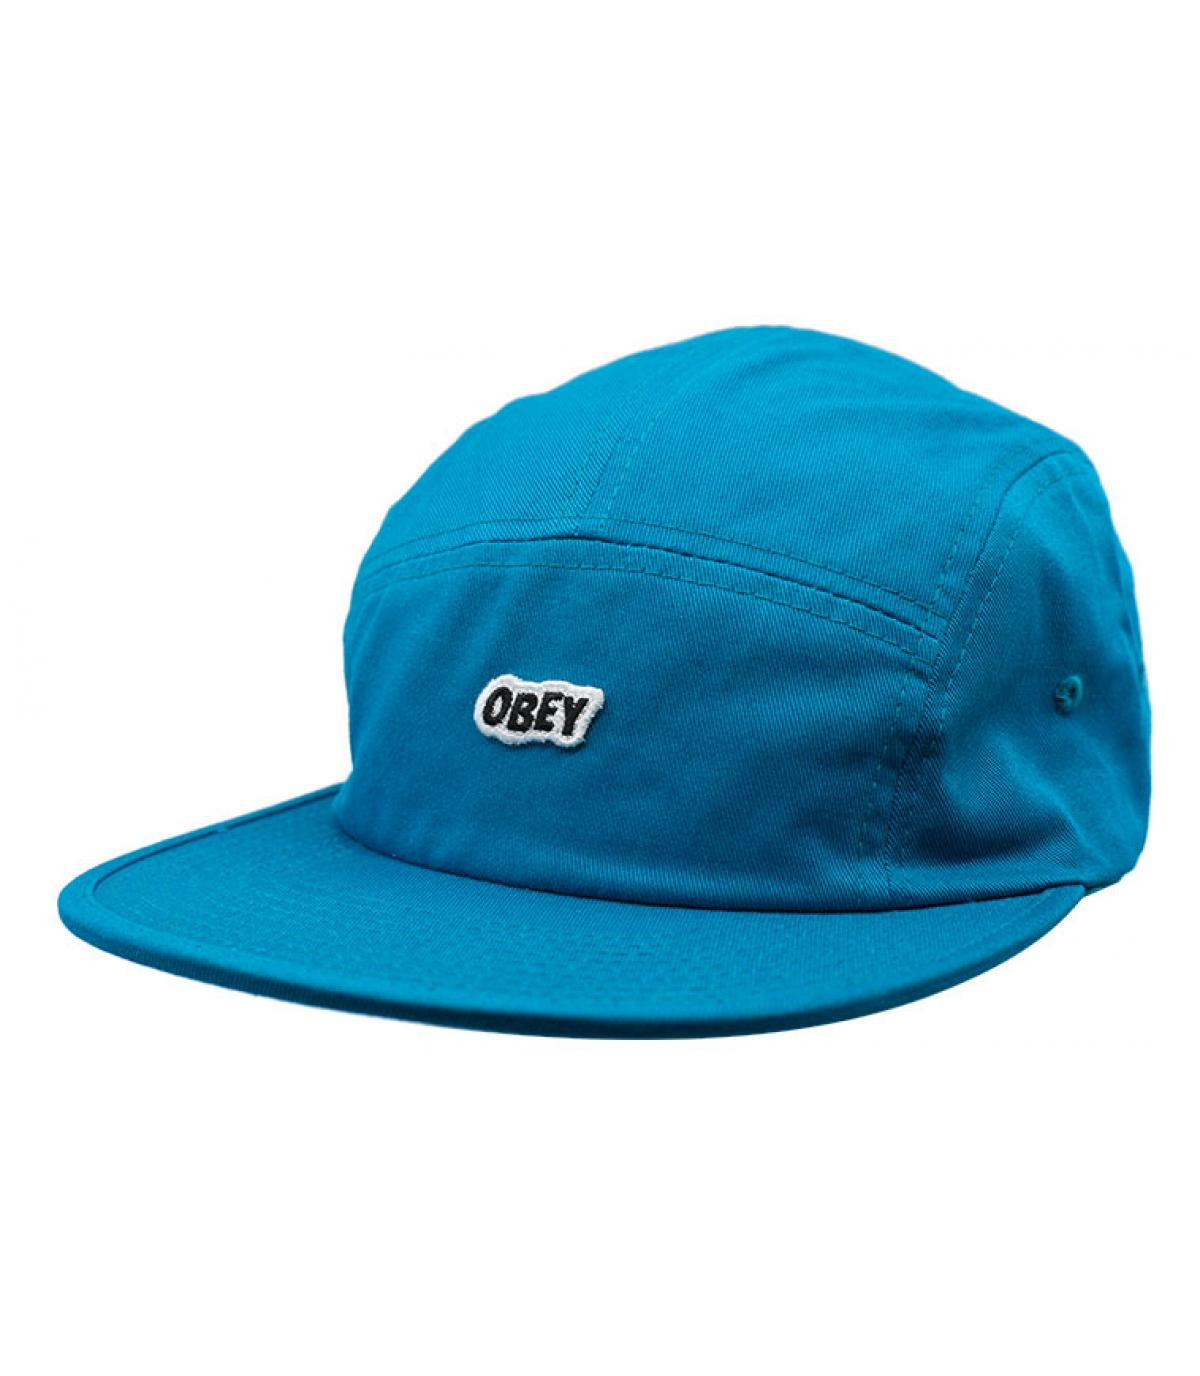 blue 5 panel cap Obey